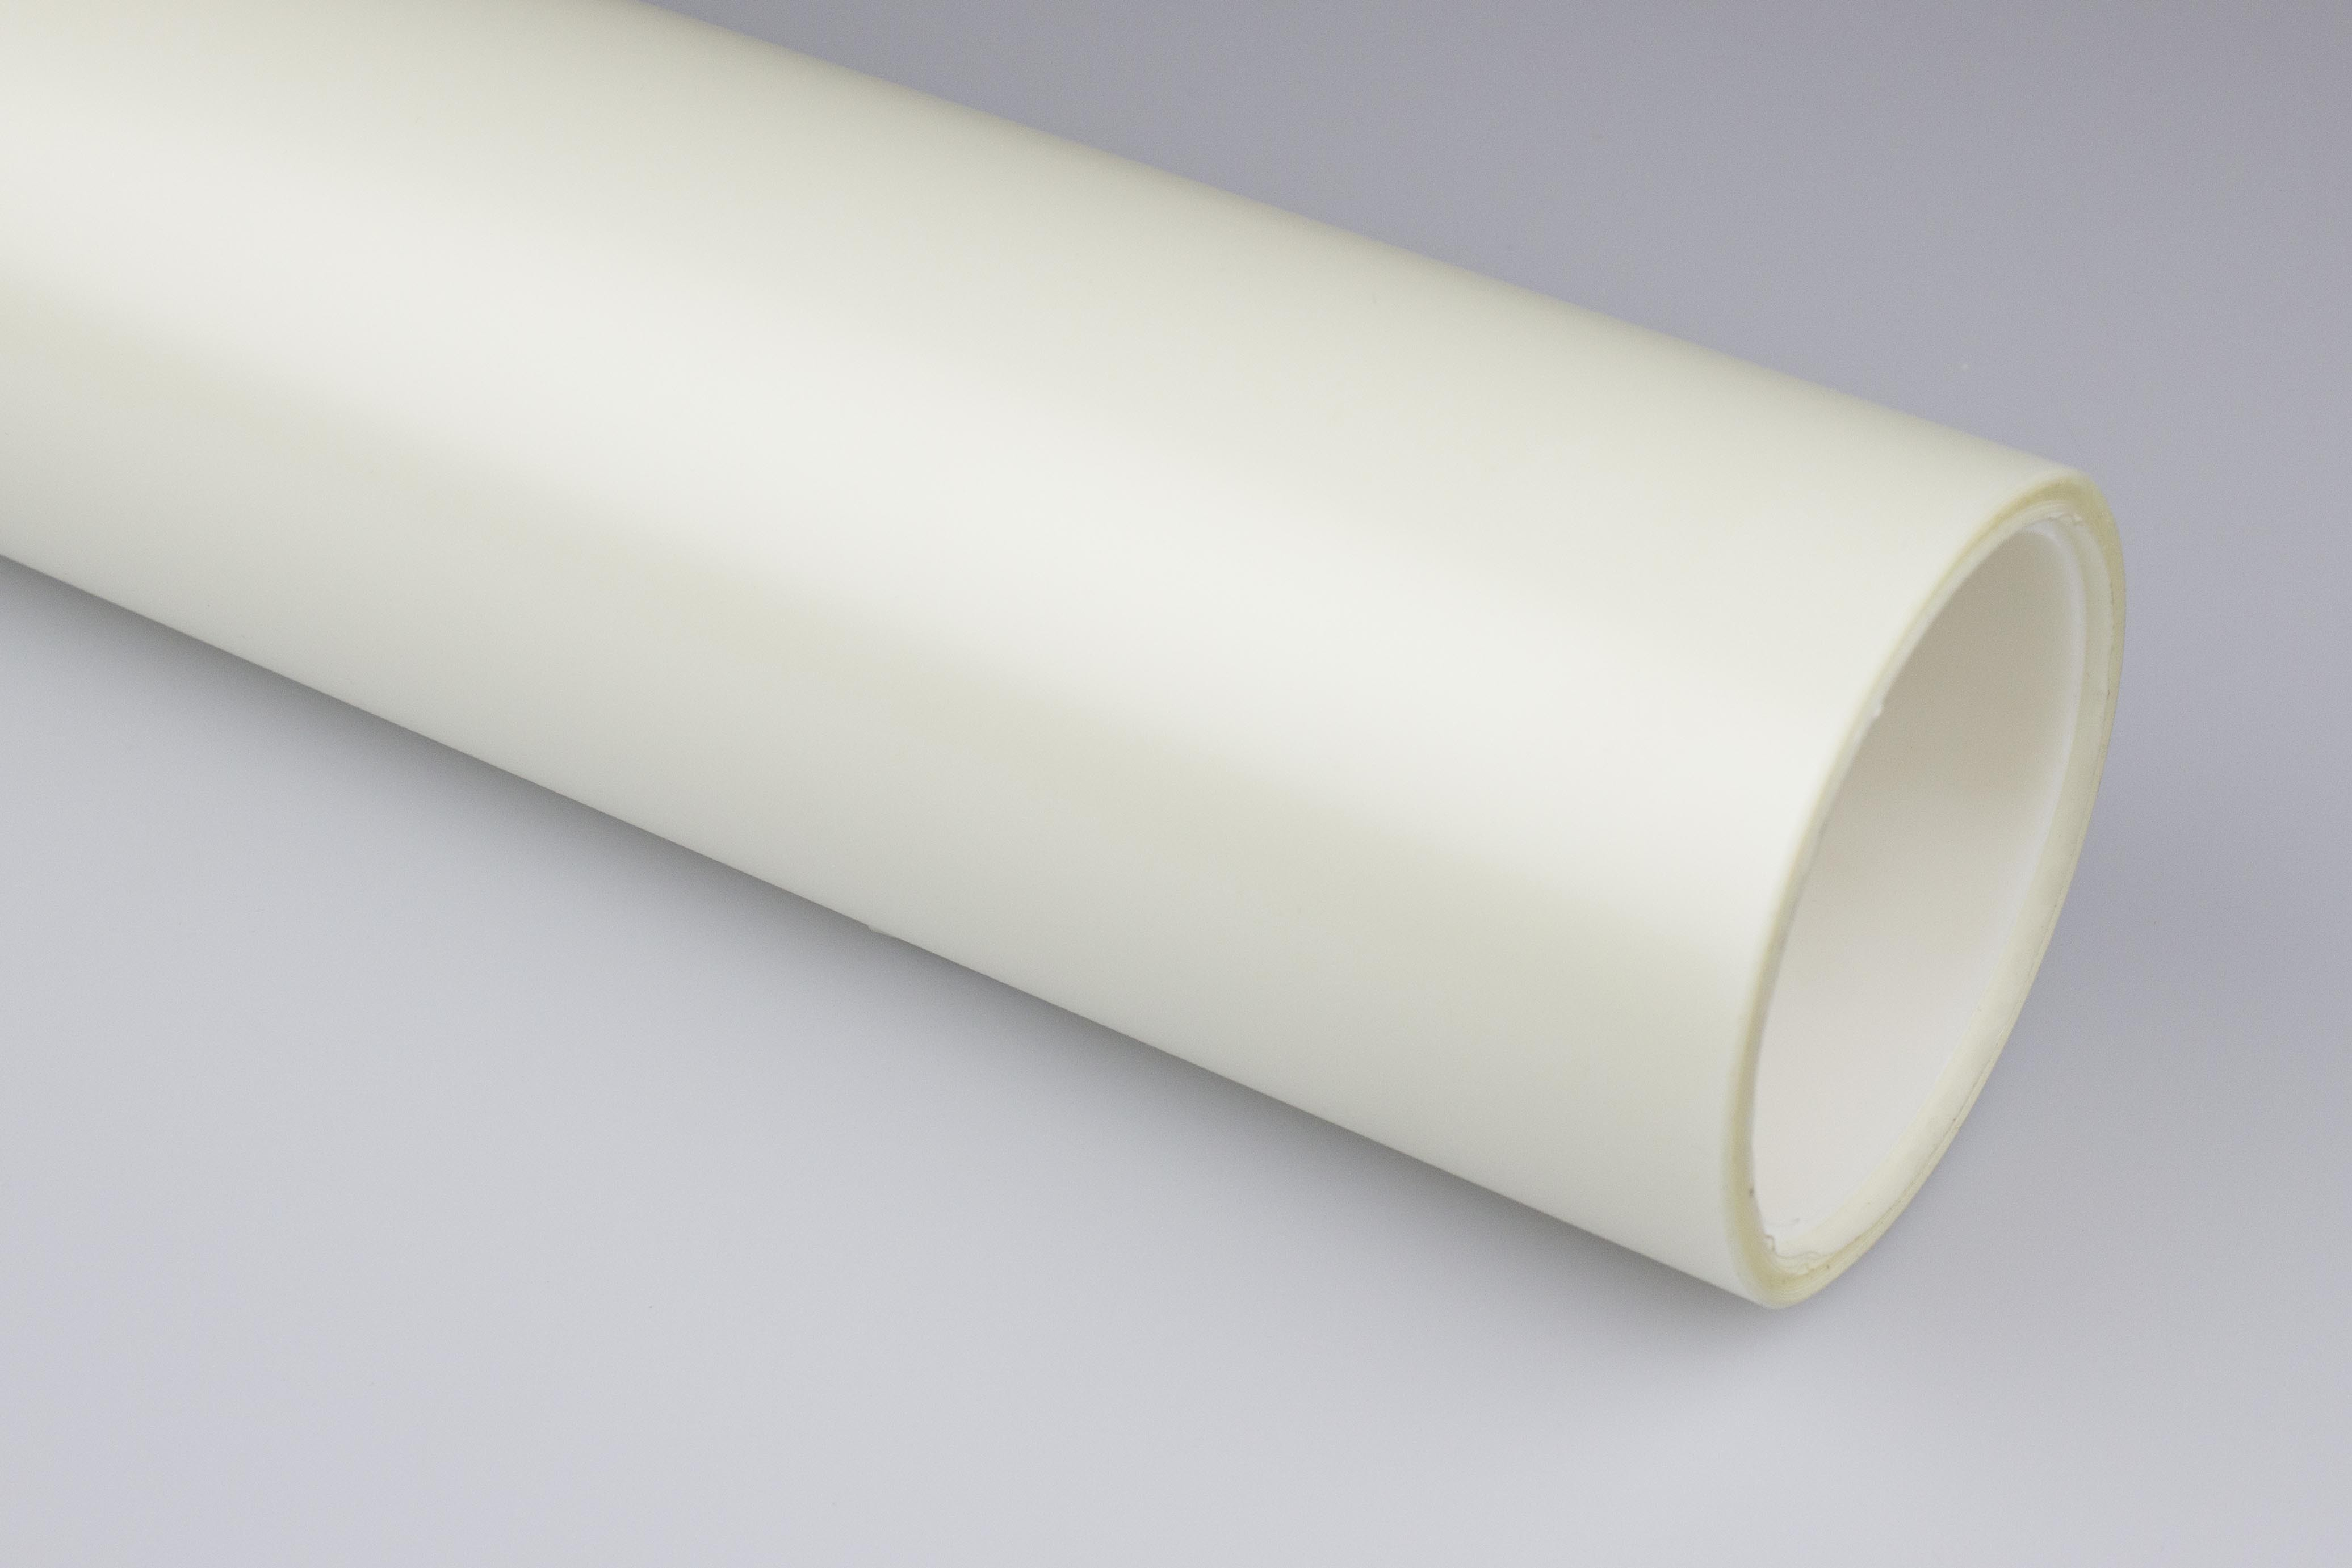 Endurance PU Paint Protection Film STX155 1,524